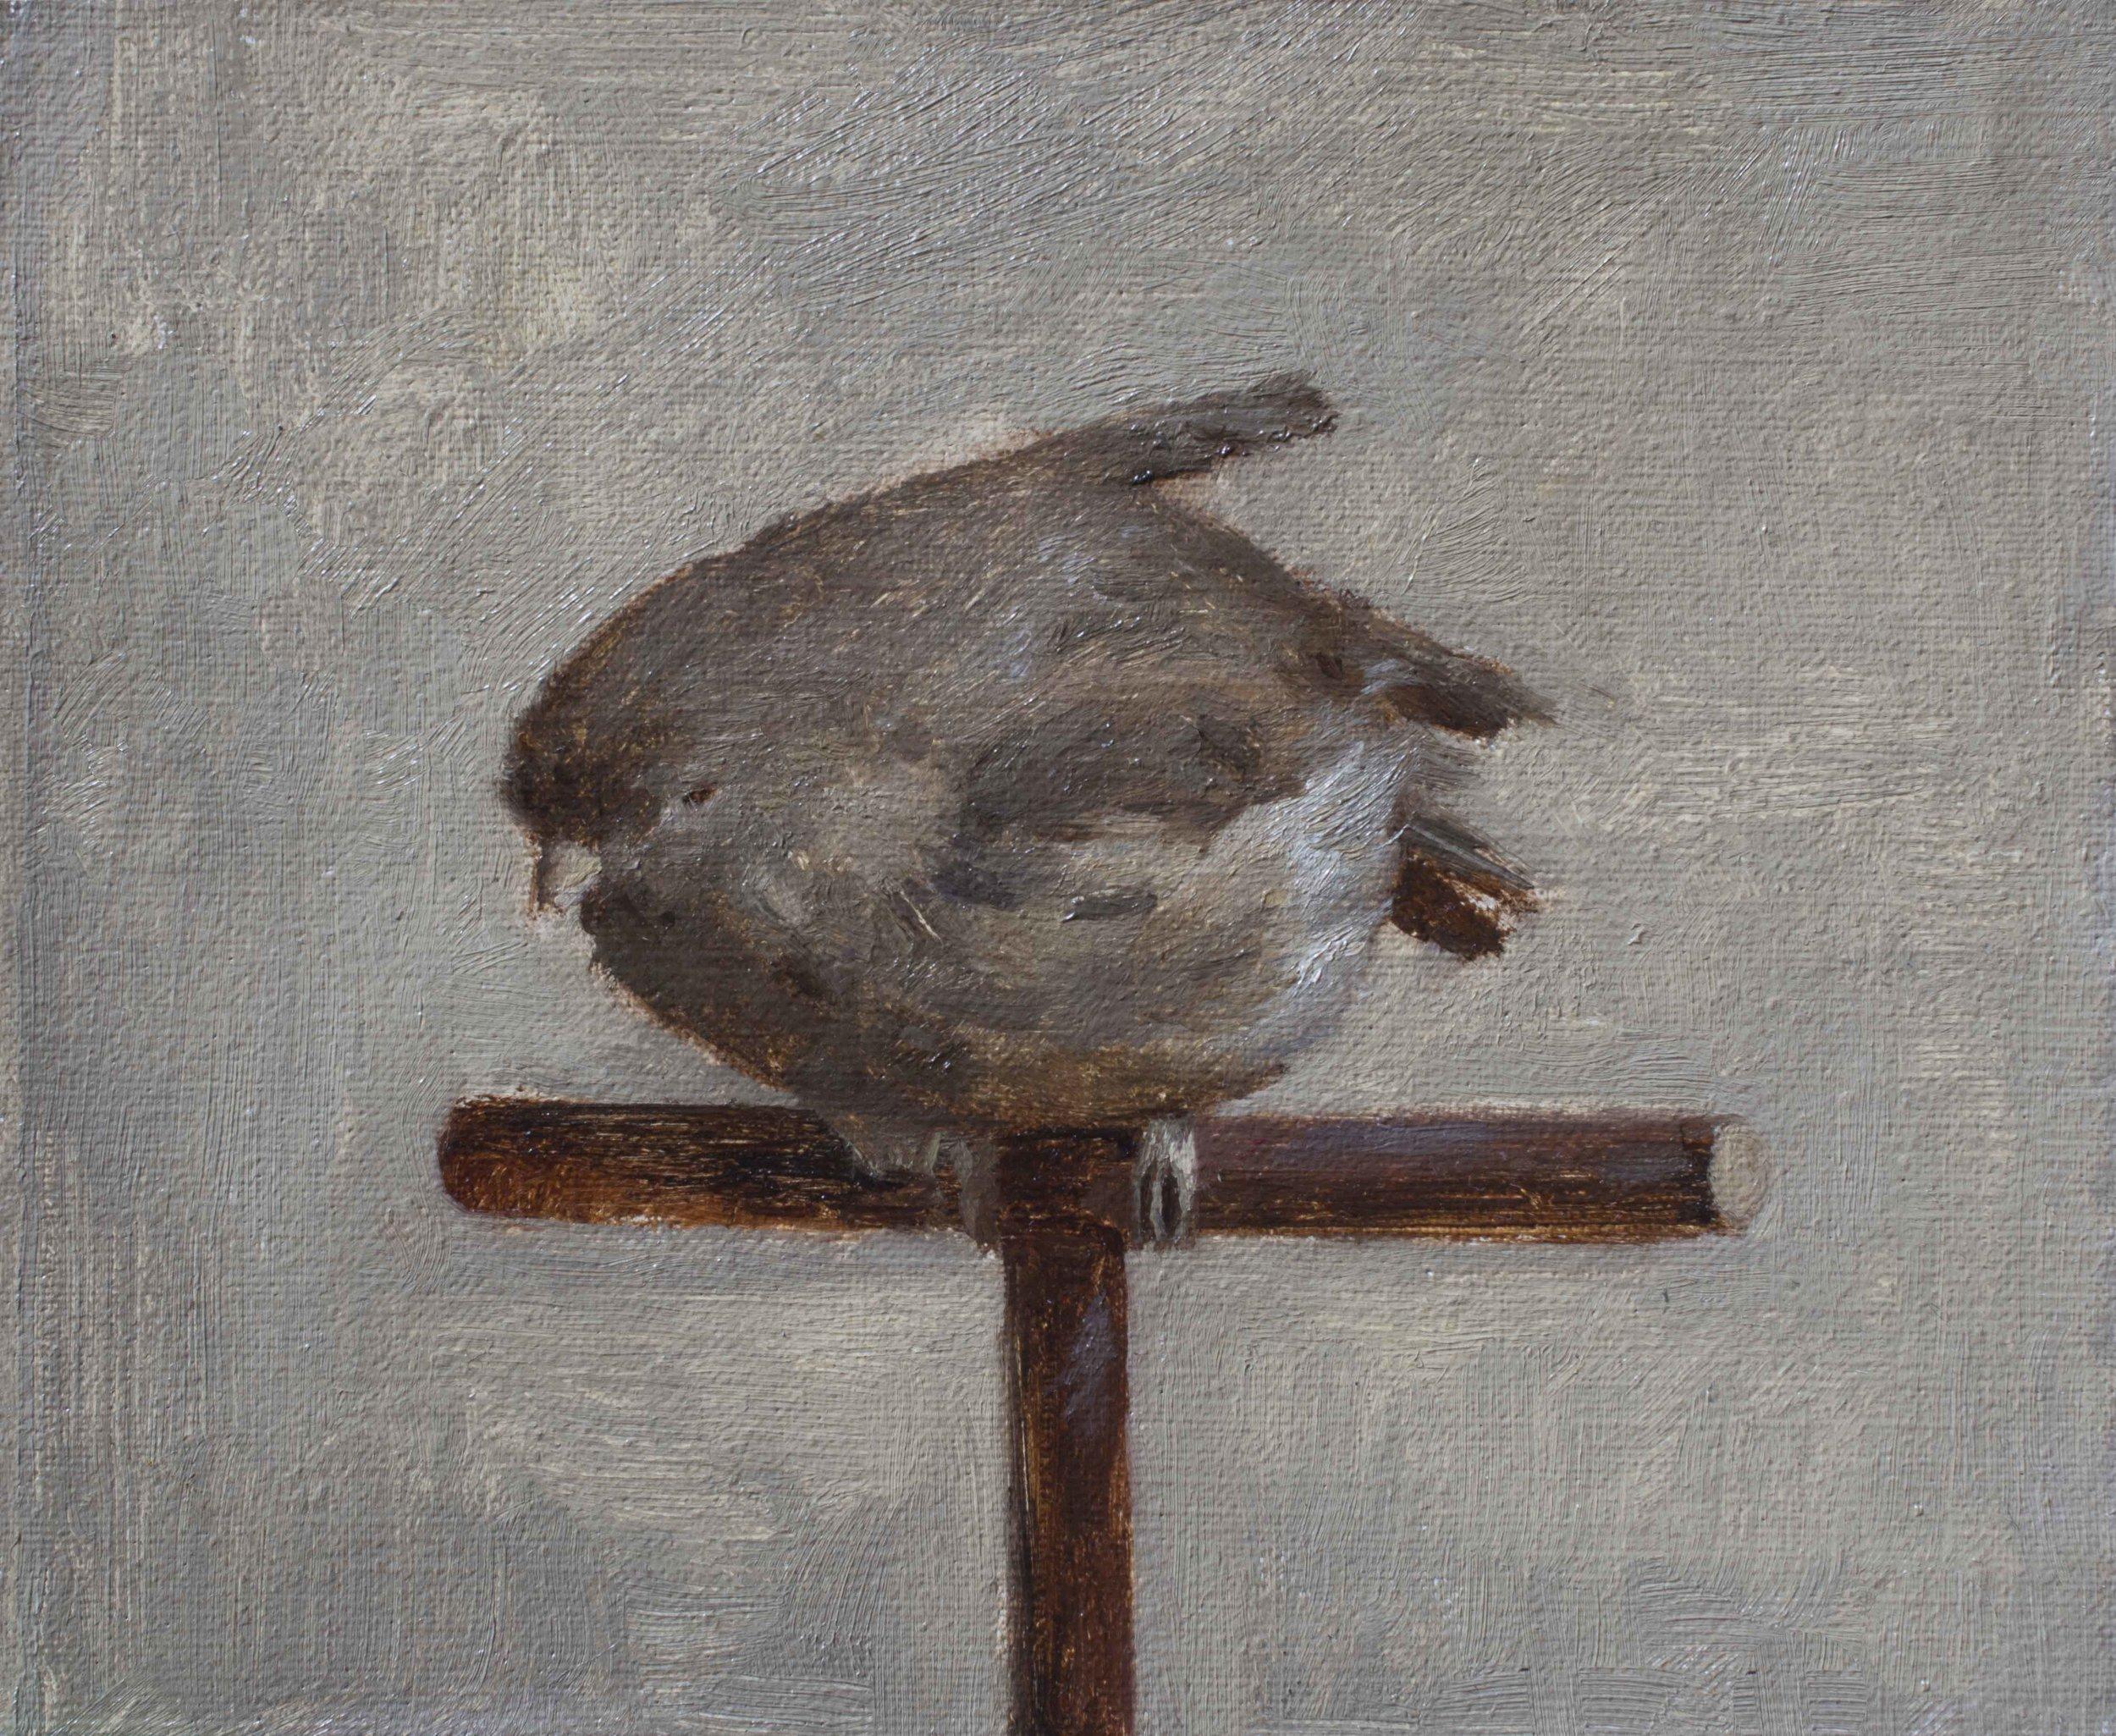 Little Sparrow. Oil on Panel. 4x5